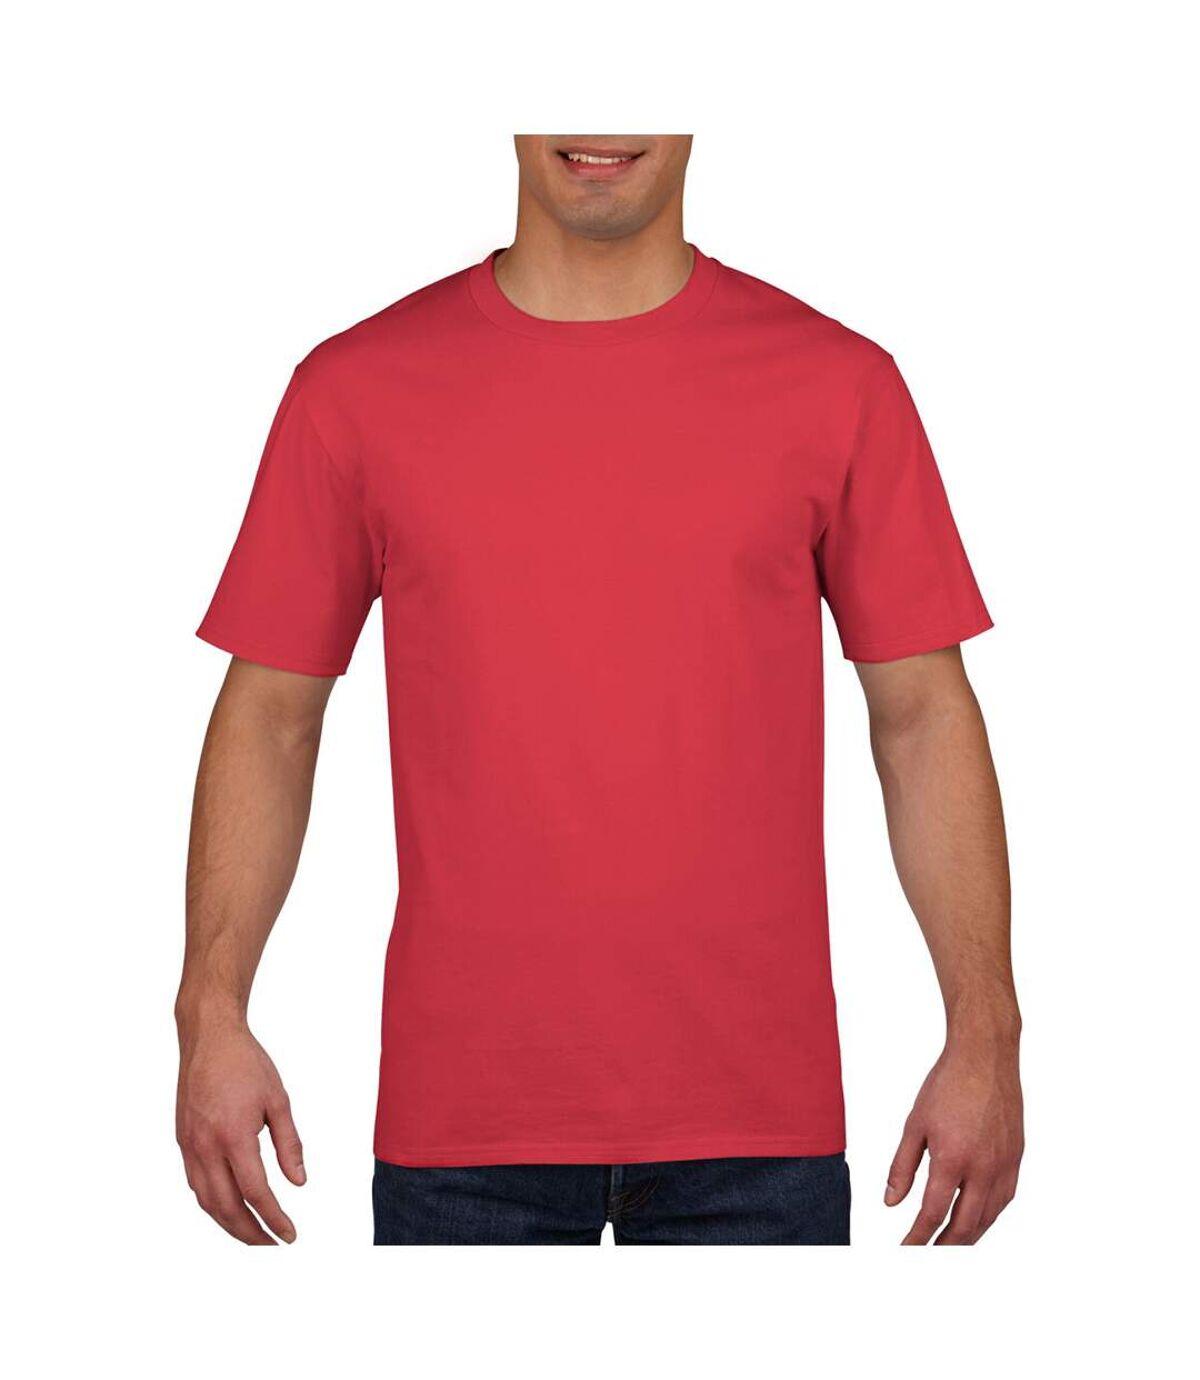 Gildan Mens Premium Cotton Ring Spun Short Sleeve T-Shirt (Red) - UTBC480